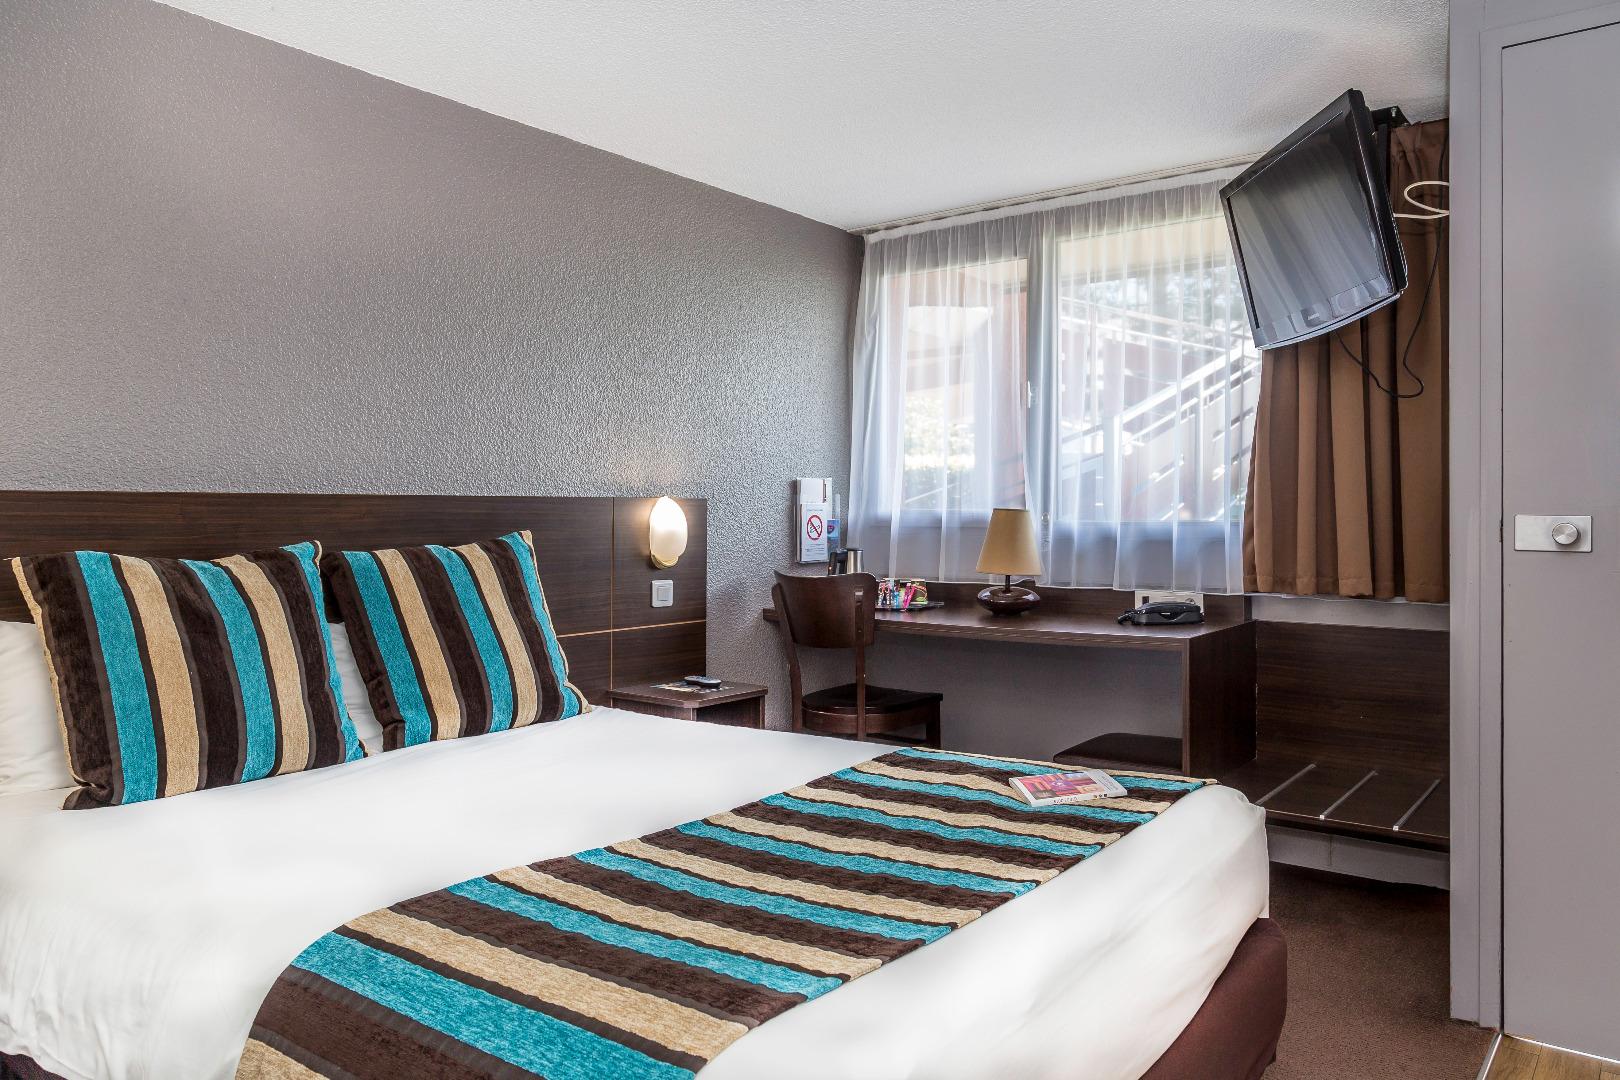 Chambre INTER-HOTEL Biarritz Aéroport Amarys à BIARRITZ